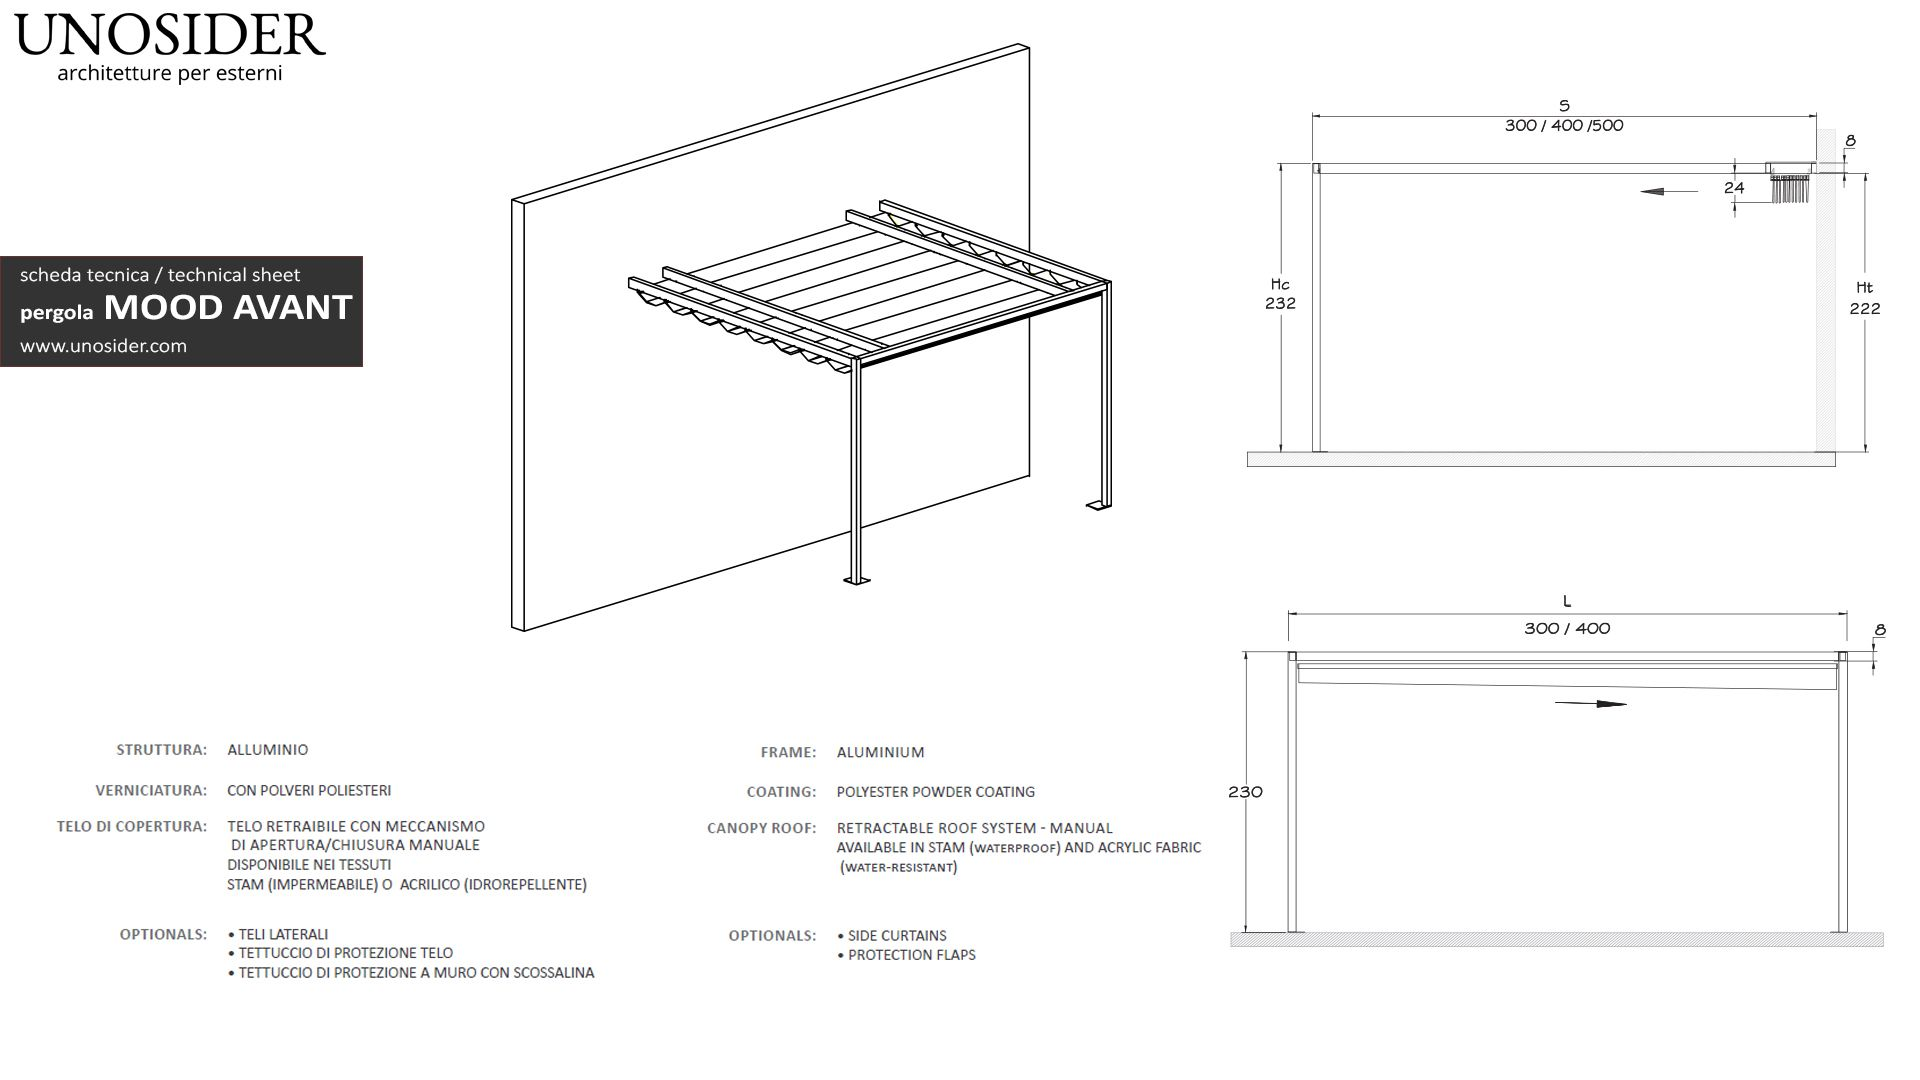 Unosider Linea Contemporanea Scheda Tecnica Pergola Mood Avant Jpg 1920 1080 Pergola Simple Designs Design